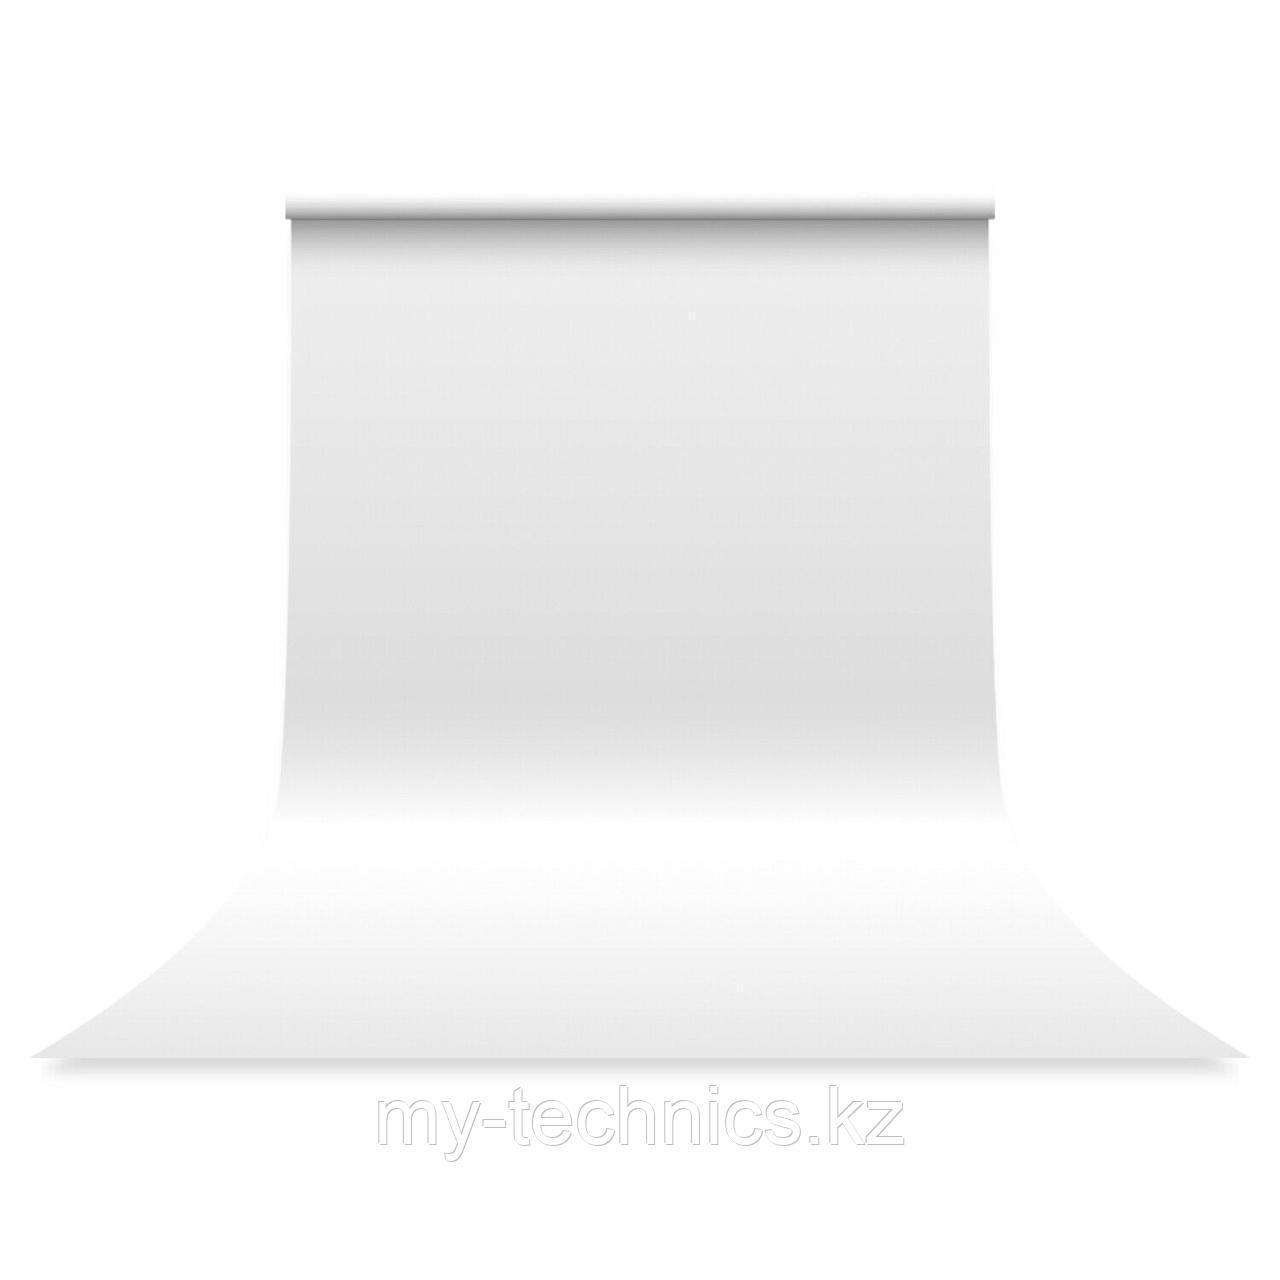 Белый фон E-Image MB36 3 х 6 м  Муслин 160G